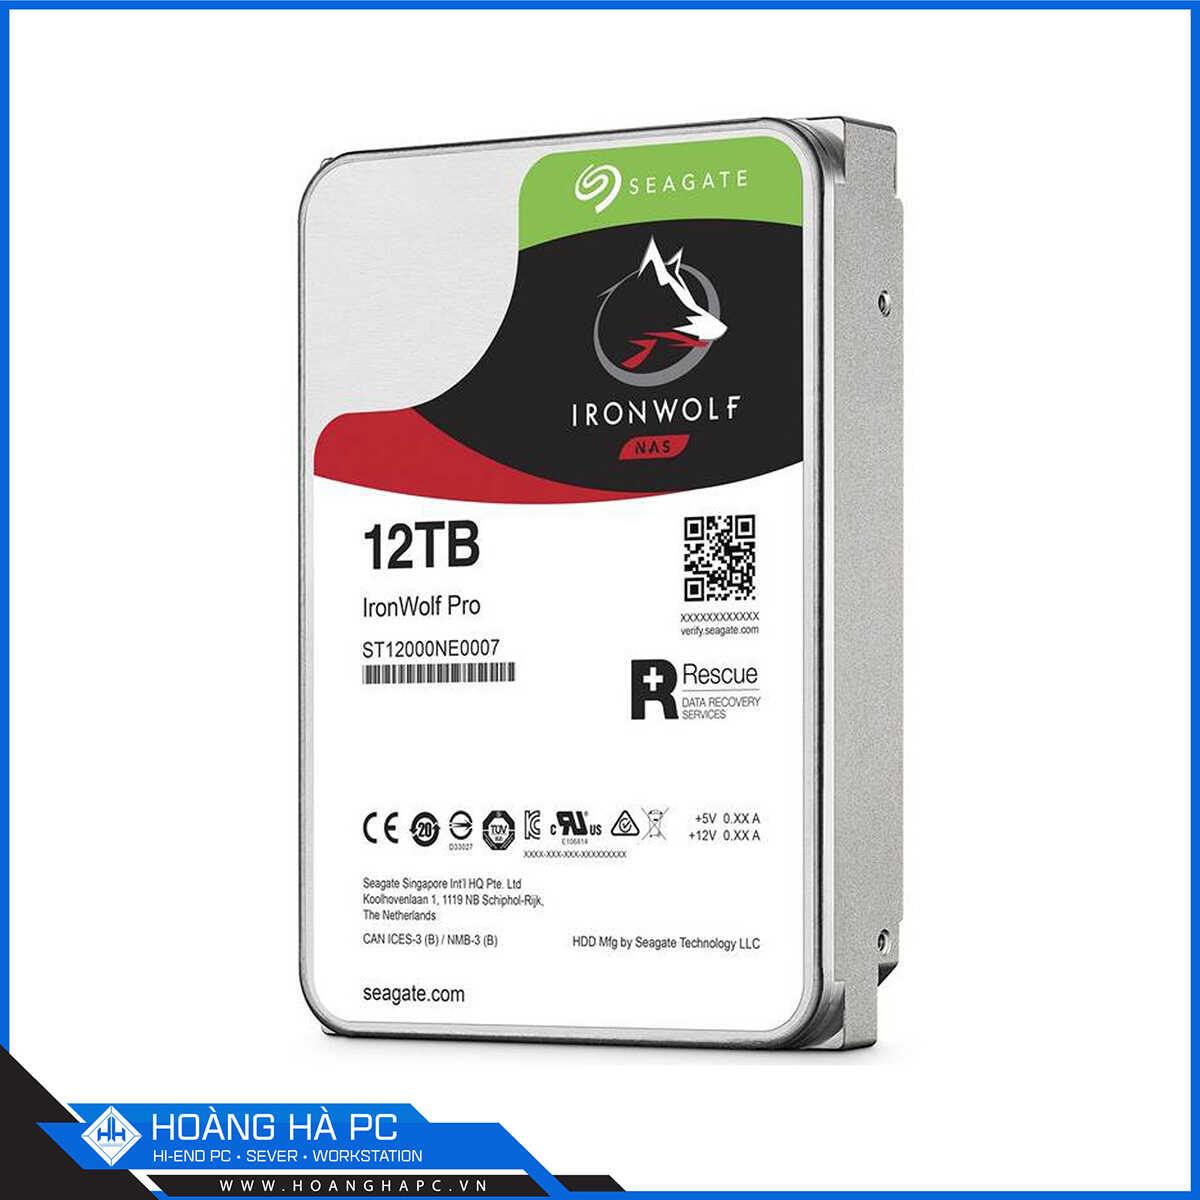 sản phẩm IronWolf Pro 12TB